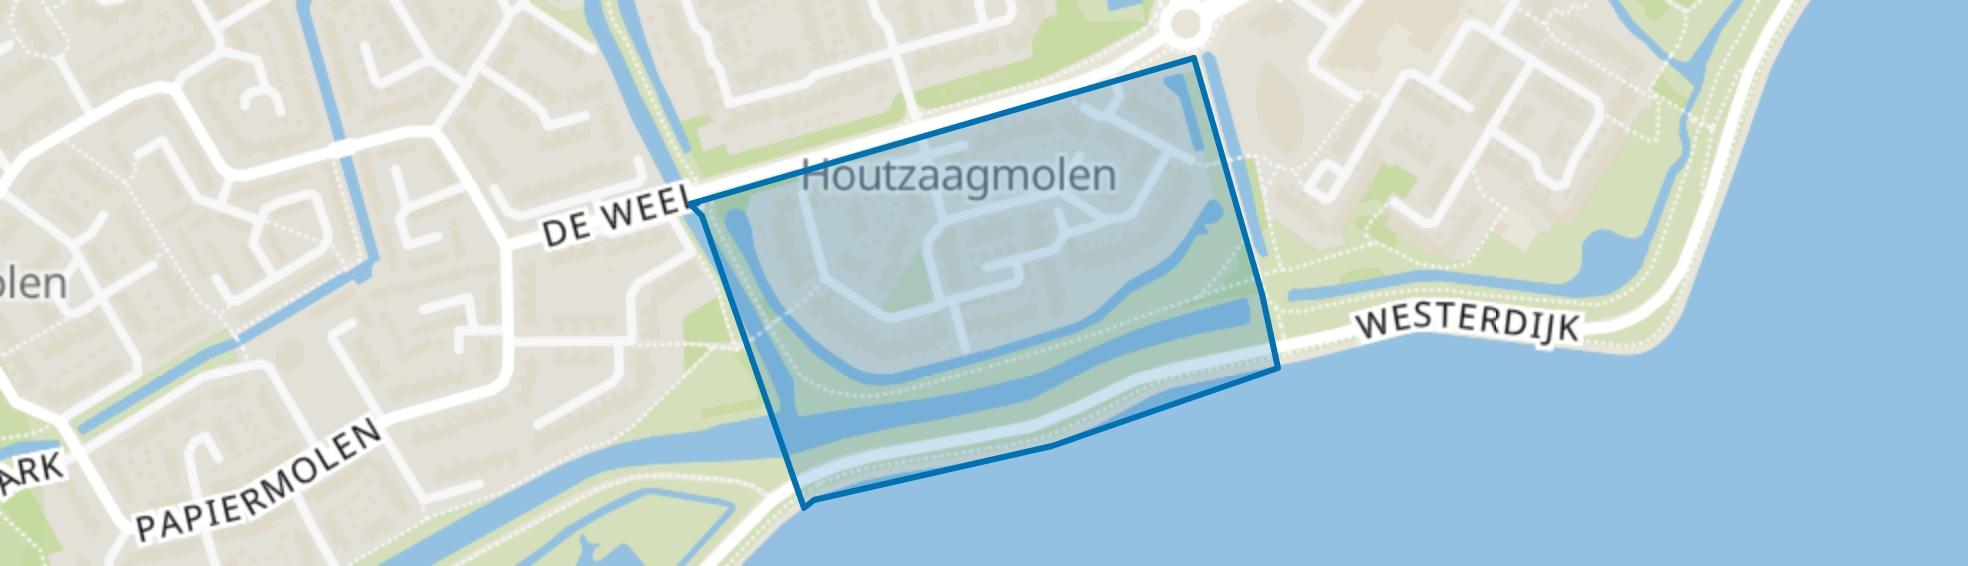 Grote Waal - Buurt 13 06, Hoorn (NH) map